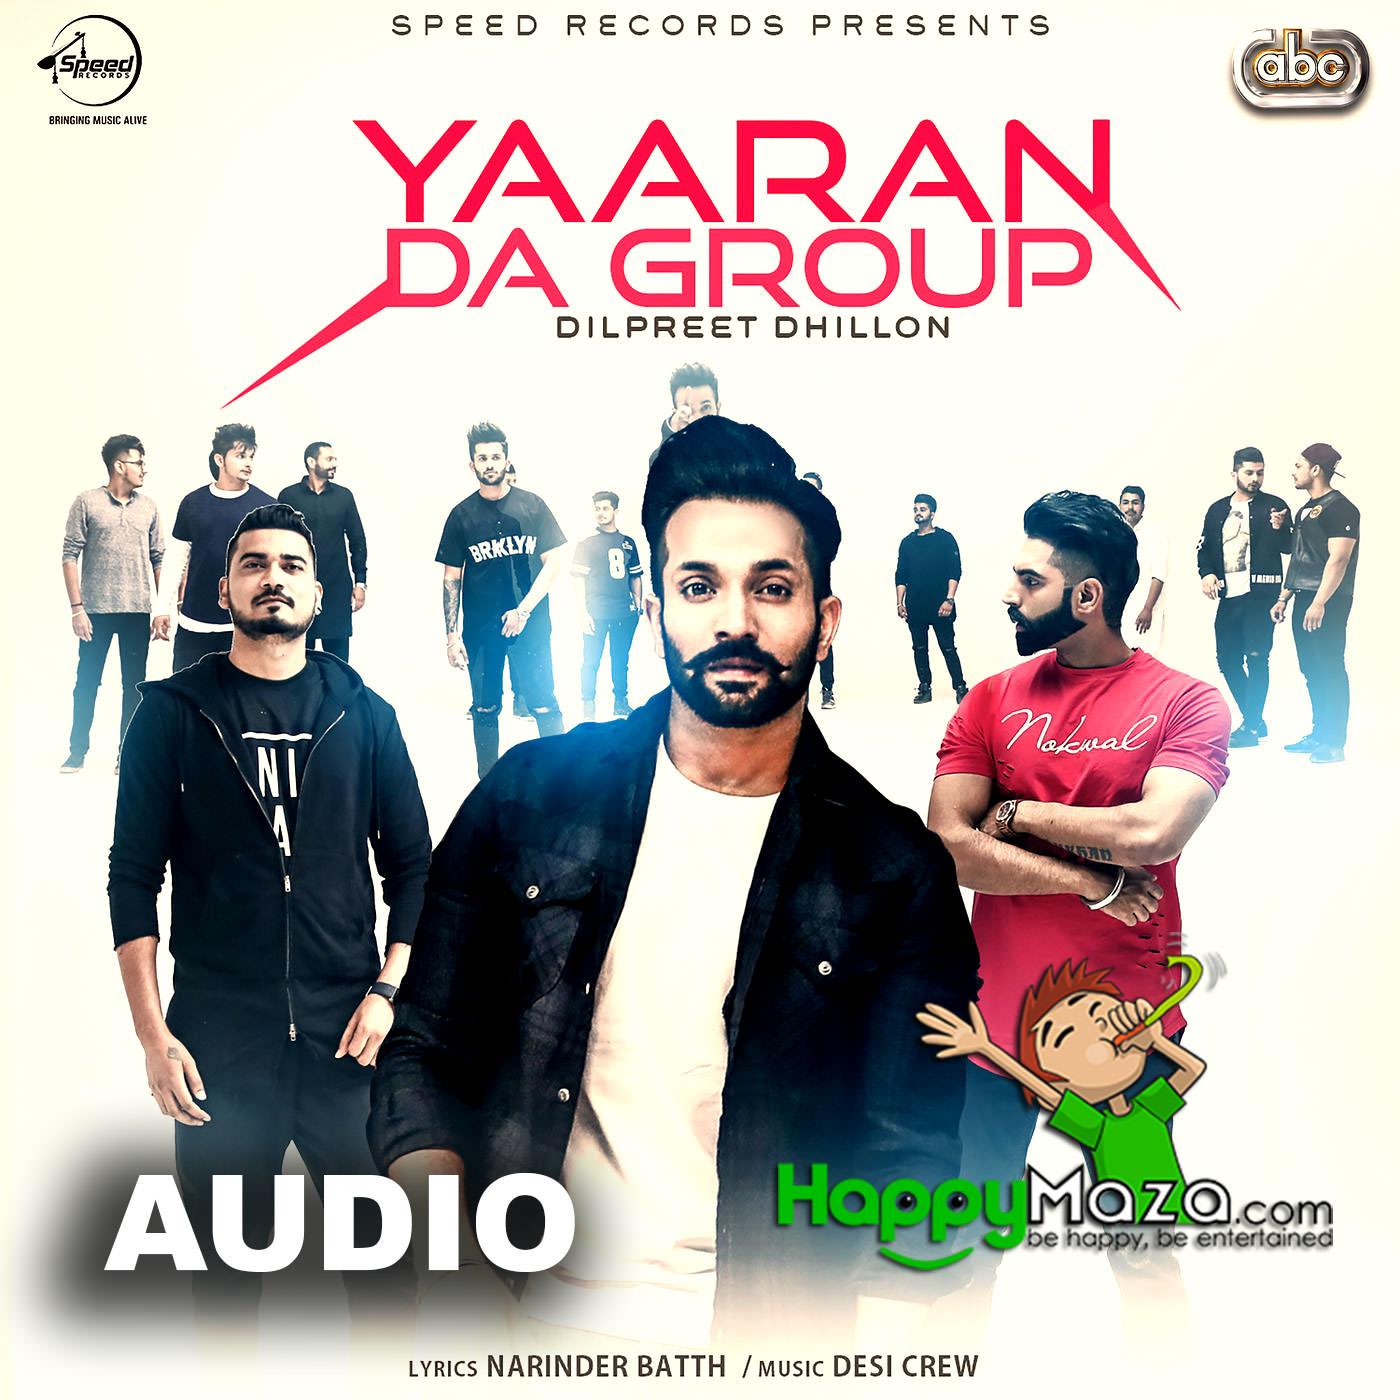 Pehli Mulakaat Song Punjabi Download 2018: Yaaran Da Group Lyrics - Dilpreet Dhillon - 2018